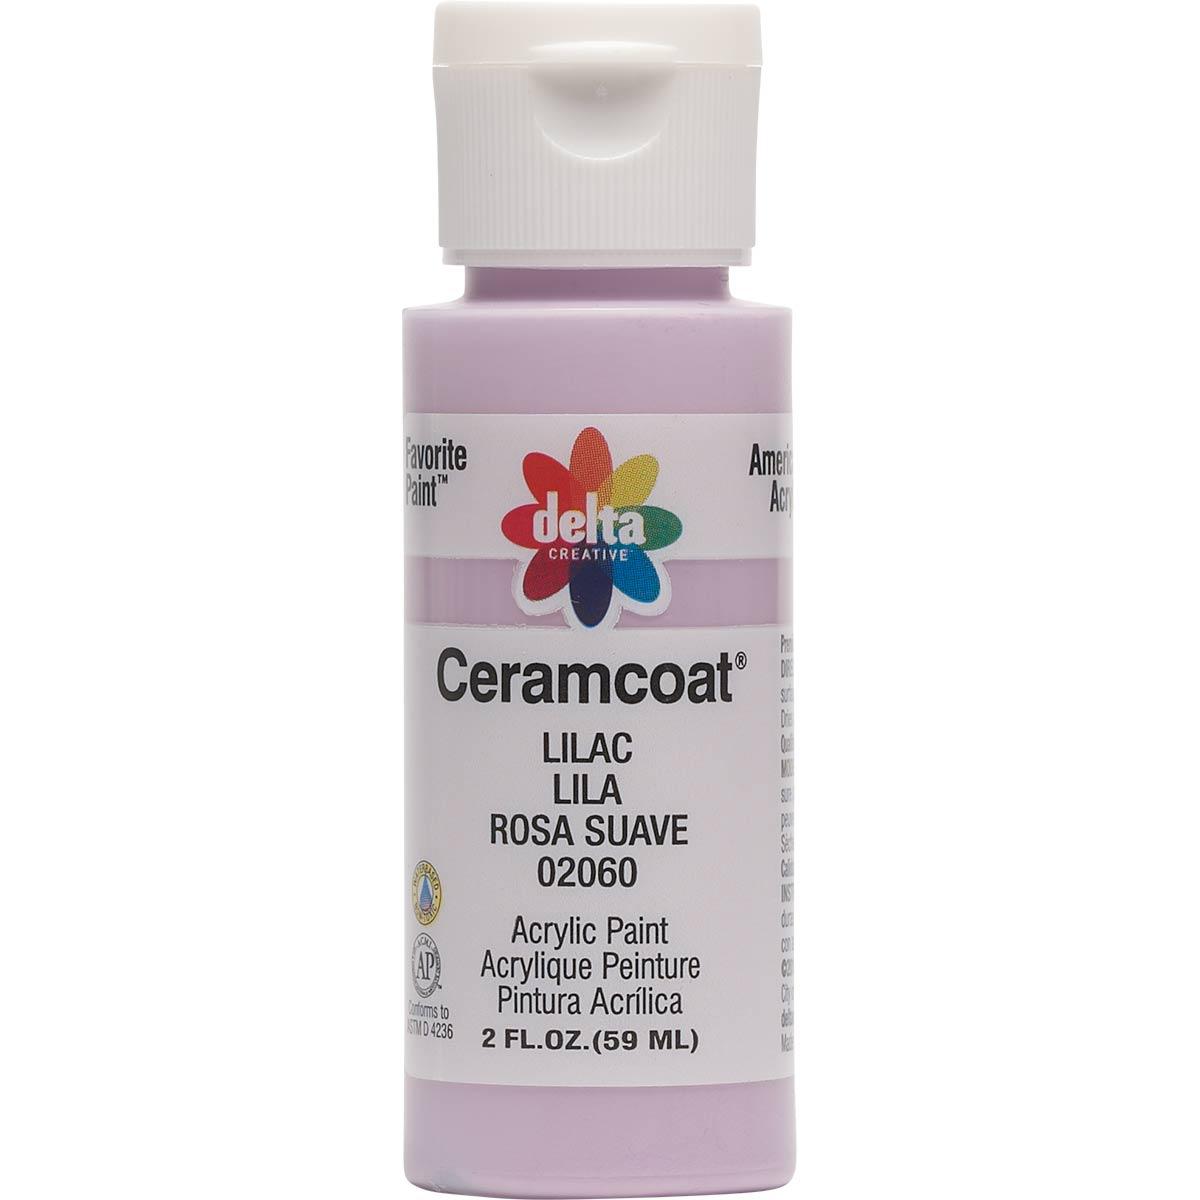 Delta Ceramcoat ® Acrylic Paint - Lilac, 2 oz.